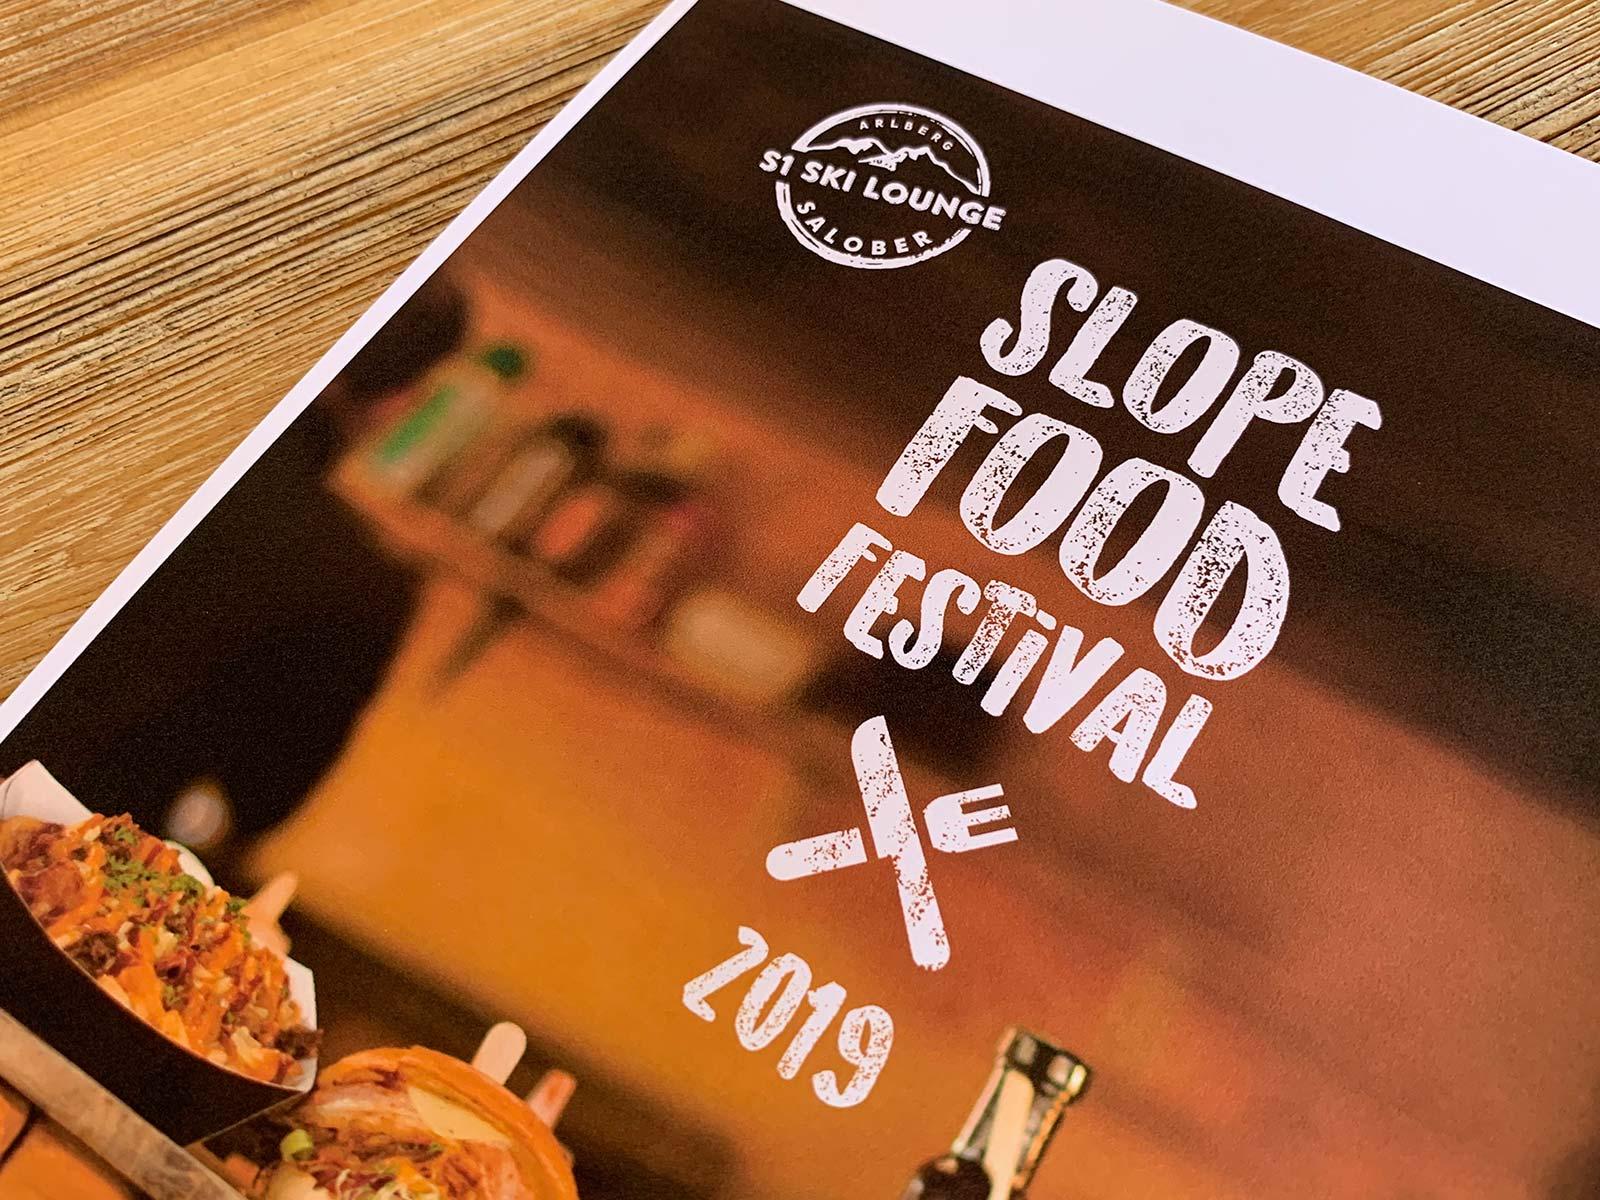 Schriftzug S1 Slope Food Festival Salober | © fein fein